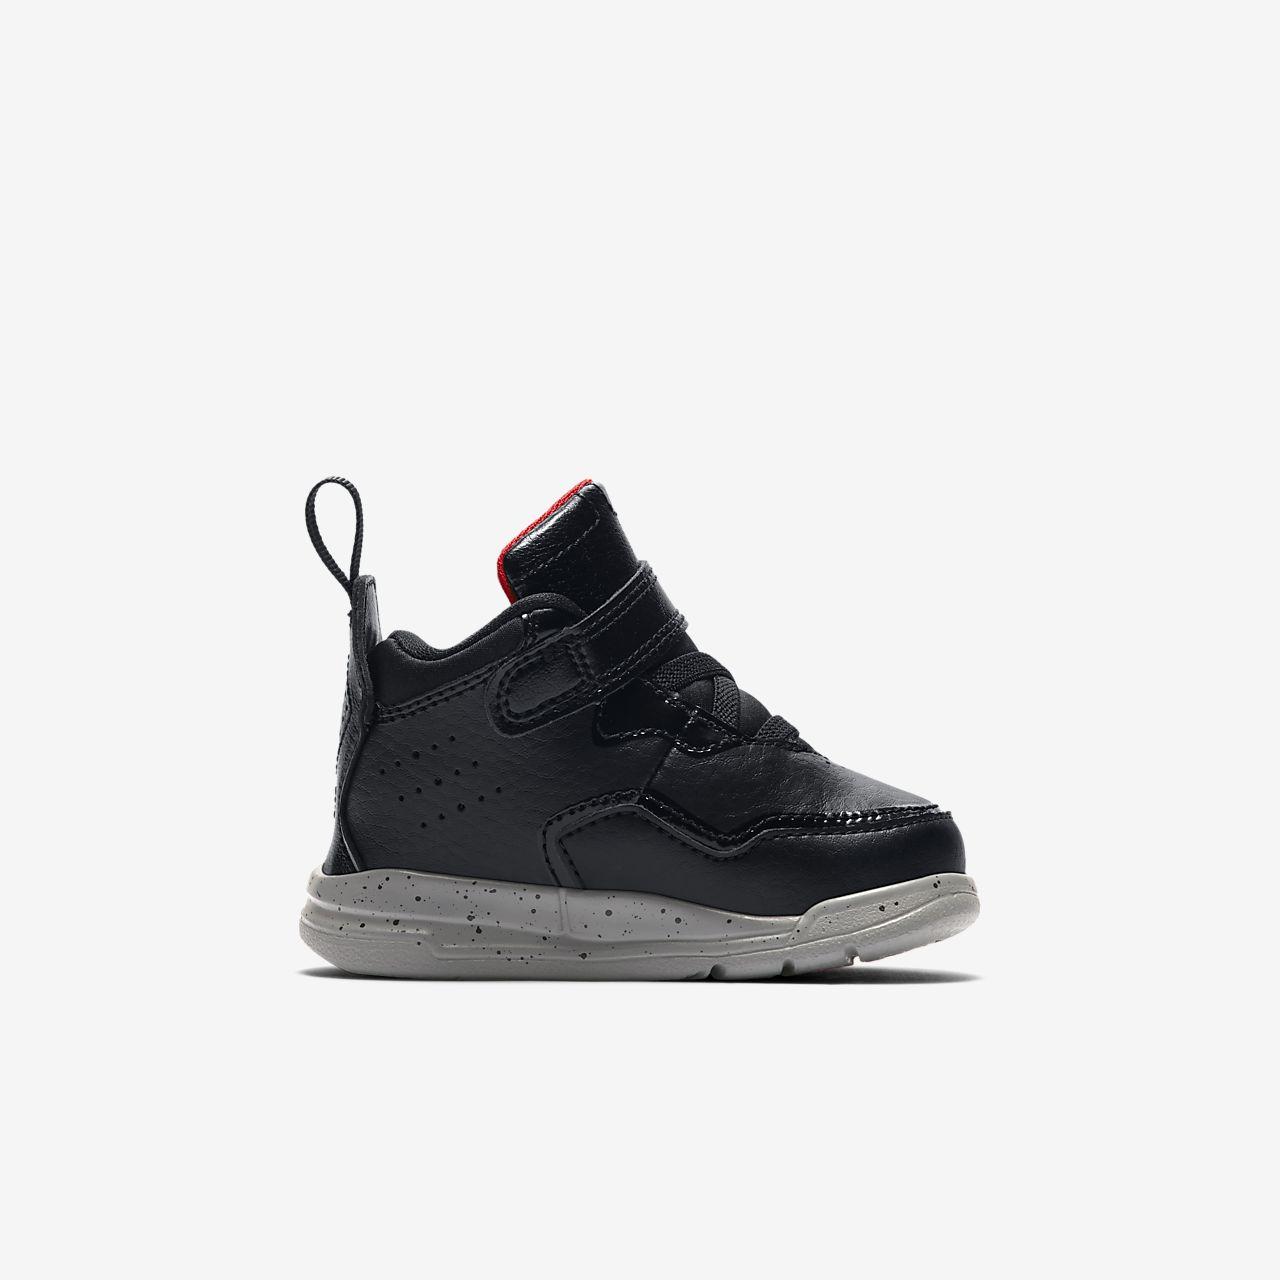 Nike Jungen Diskont 23 Baby Schuhe Tkc1jlf3 1uTJc3FKl